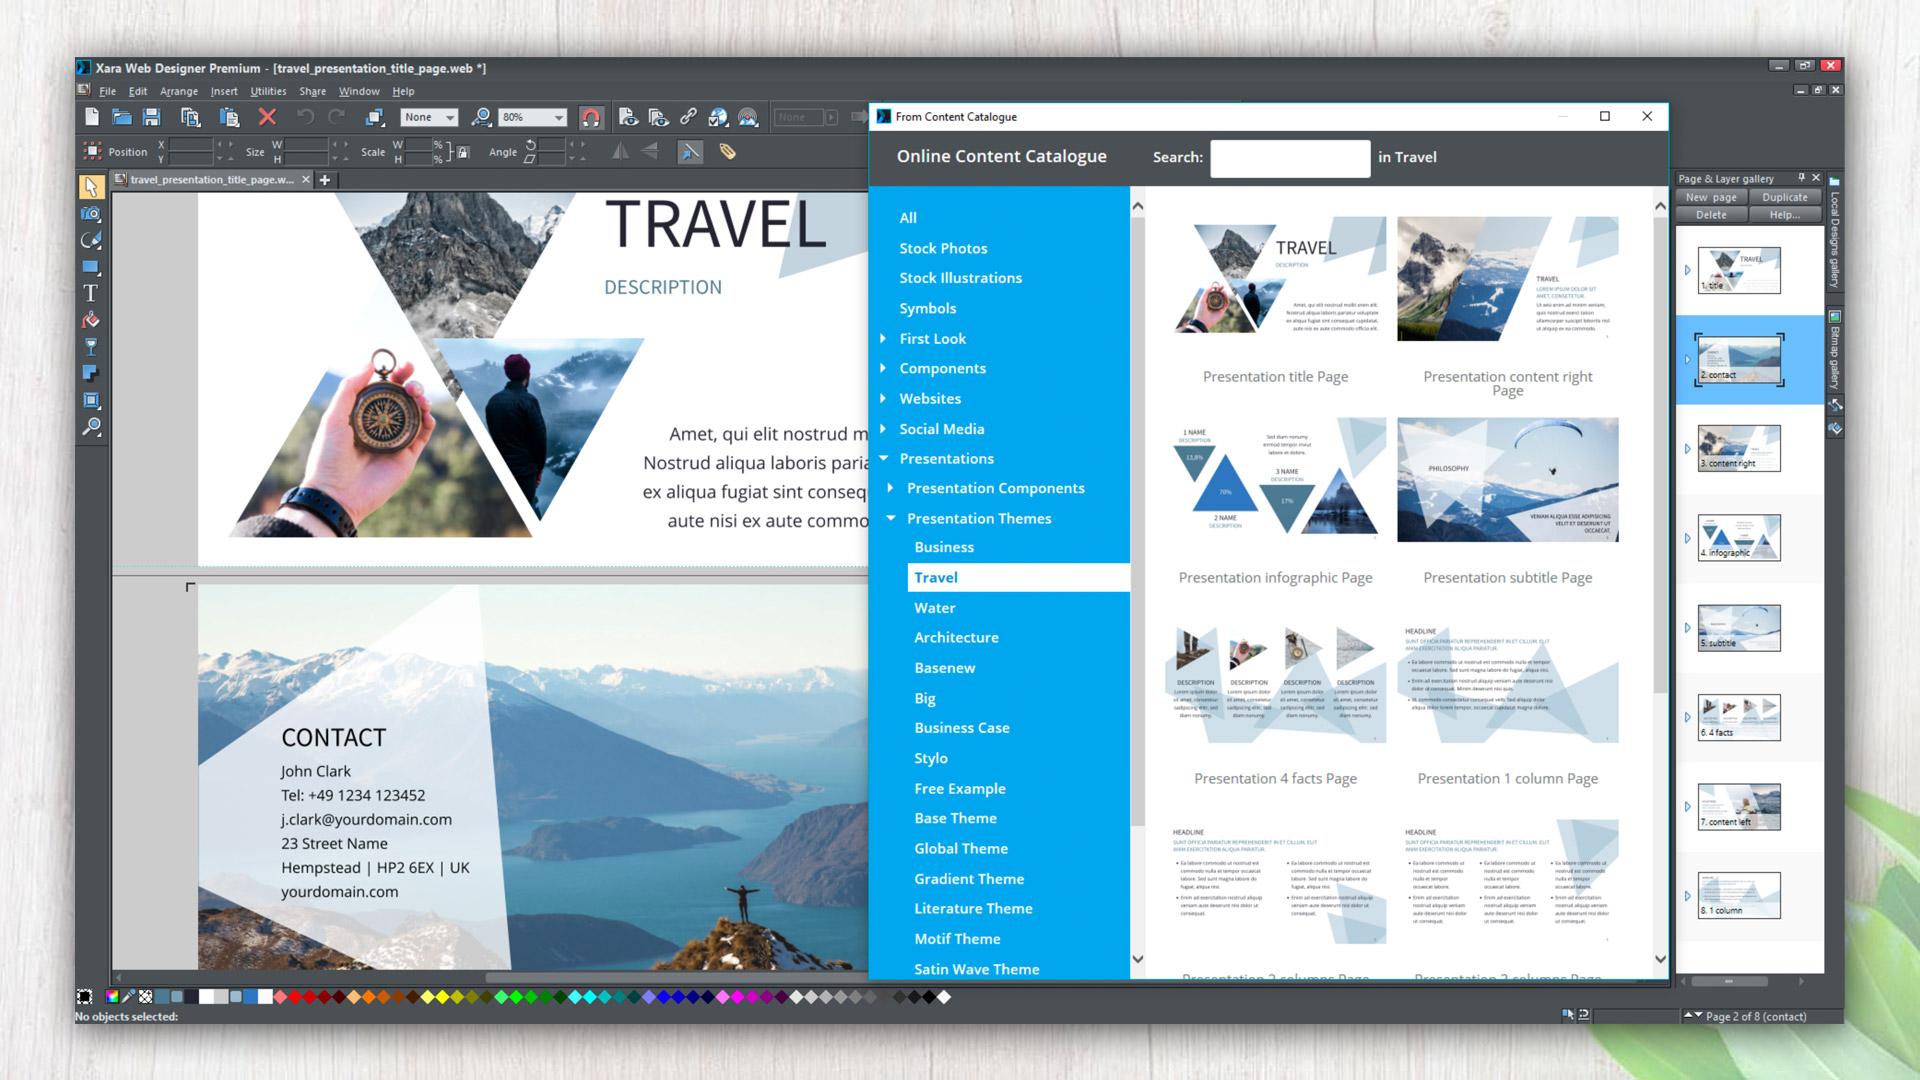 Web Designer 15 Premium Steam Edition screenshot